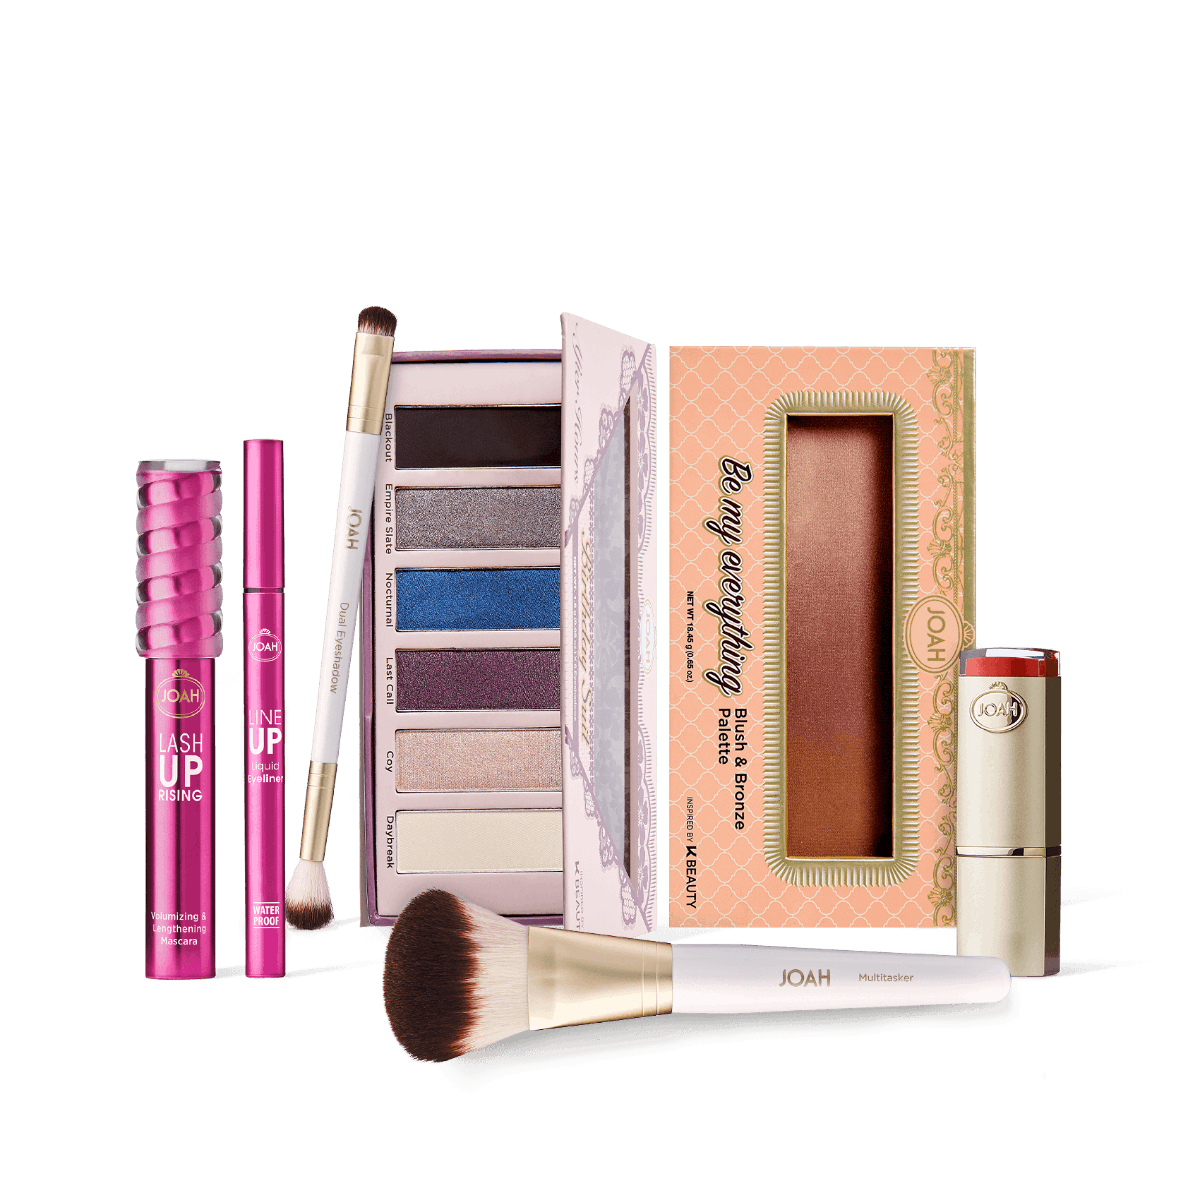 JOAH Beauty Glam On Gift Bundle + FREE cosmetic bag